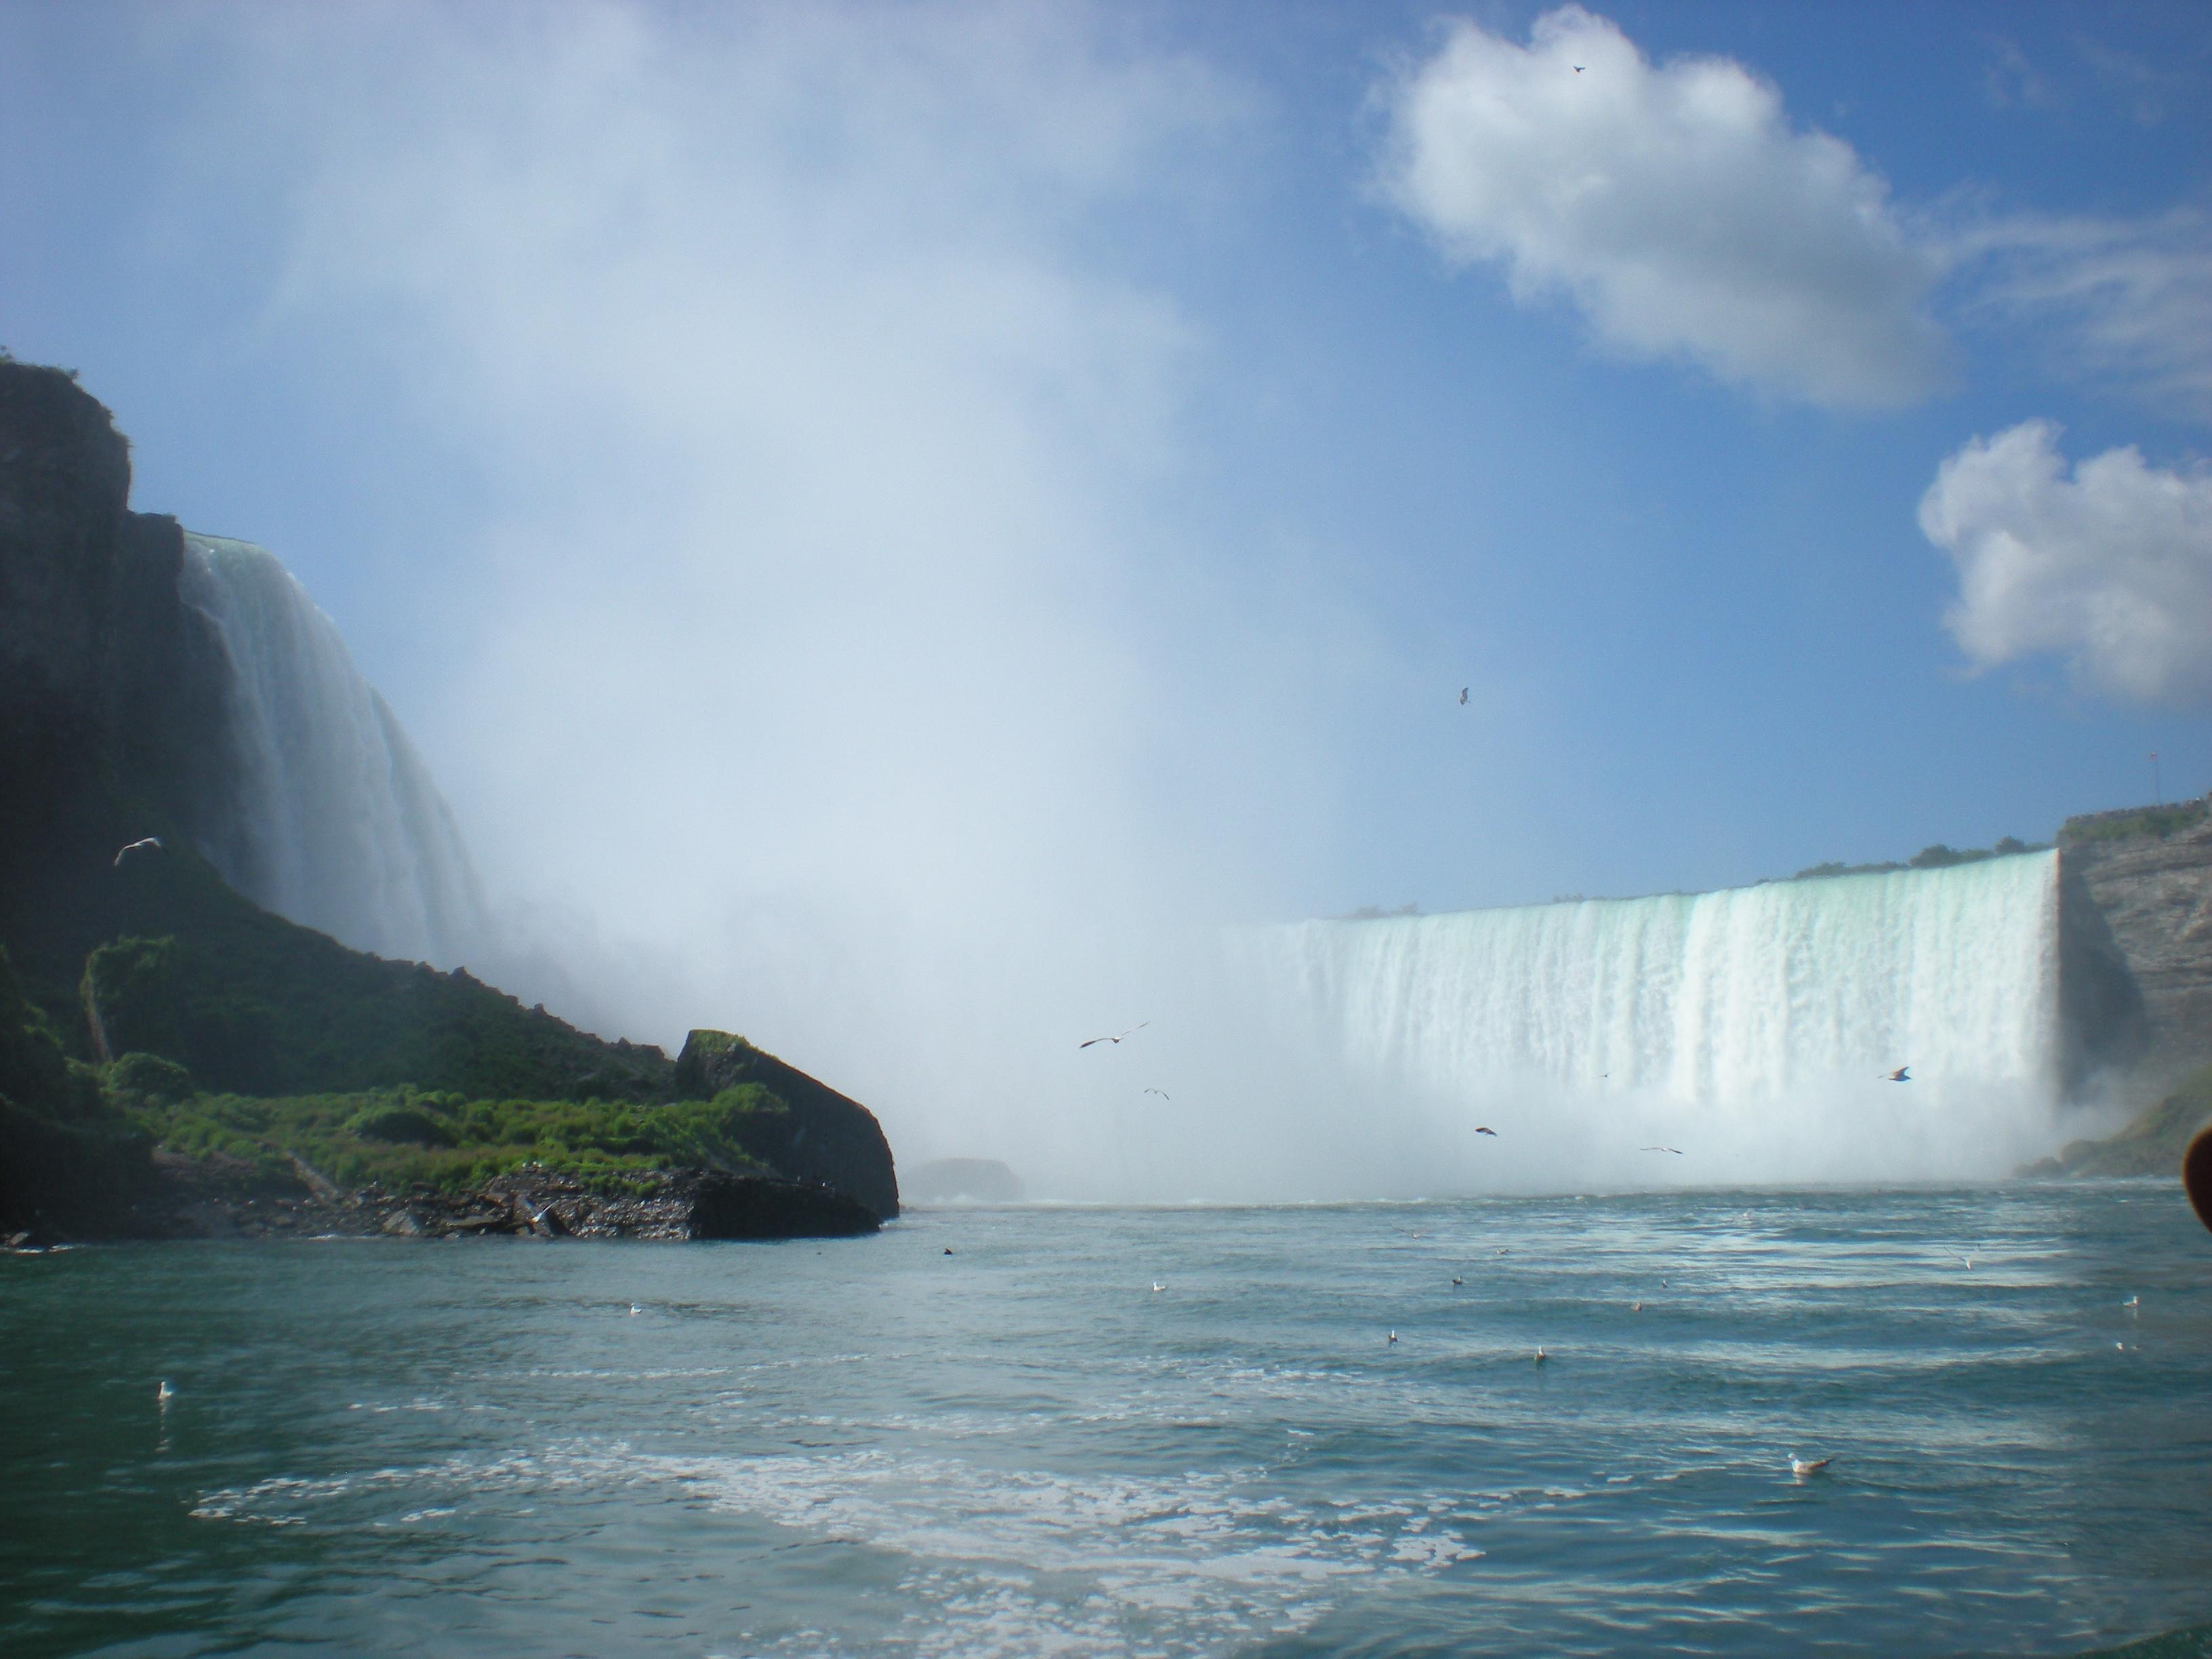 Chutes du Niagara (côté canadien depuis le bâteau)